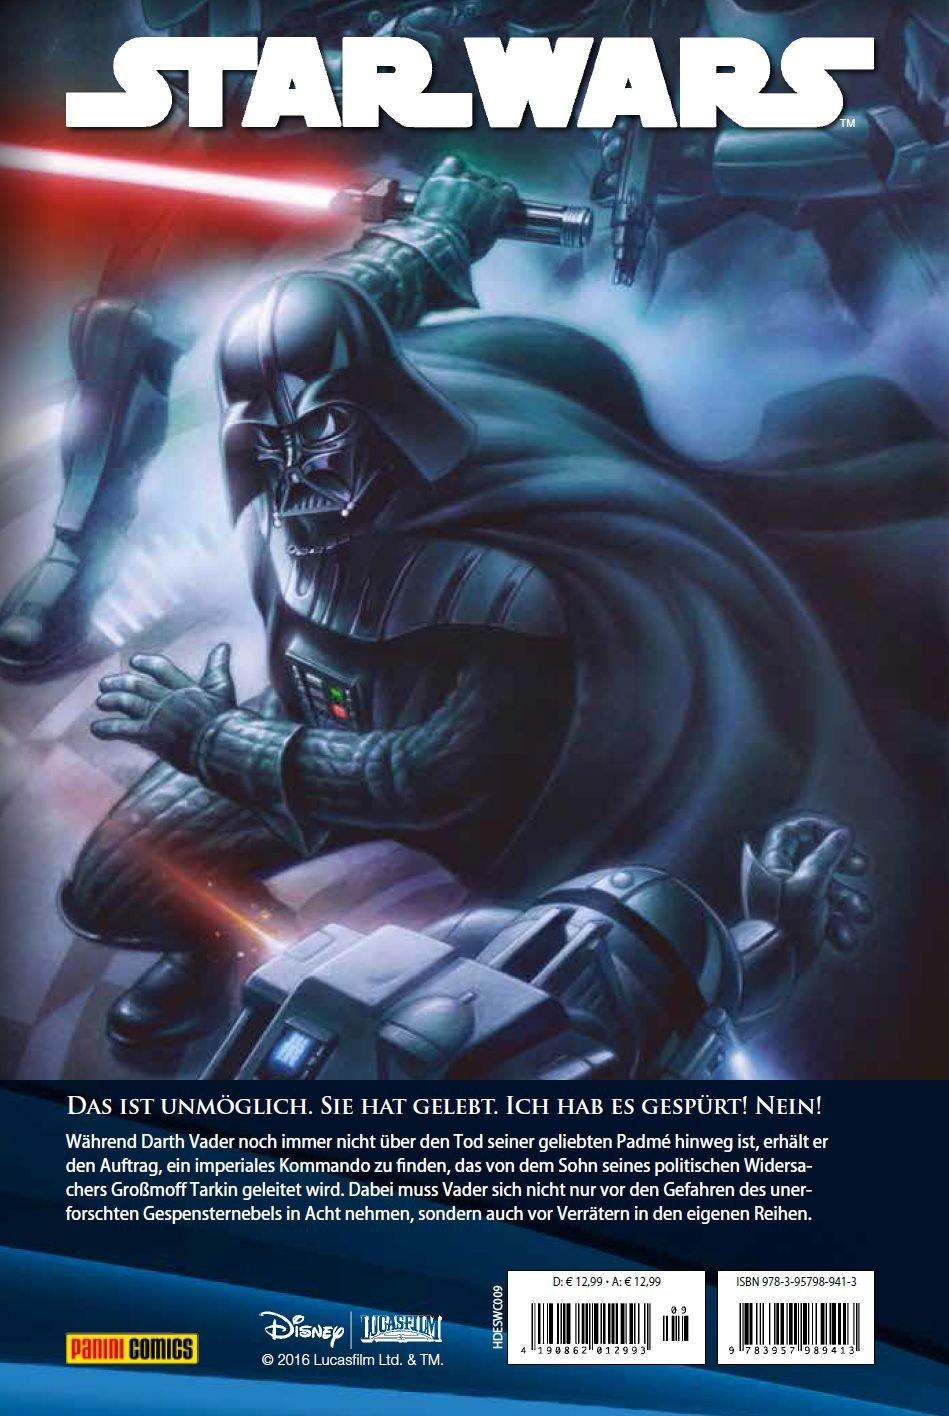 Star Wars Comic-Kollektion, Band 9: Darth Vader und das verlorene Kommando - Cover Rückseite